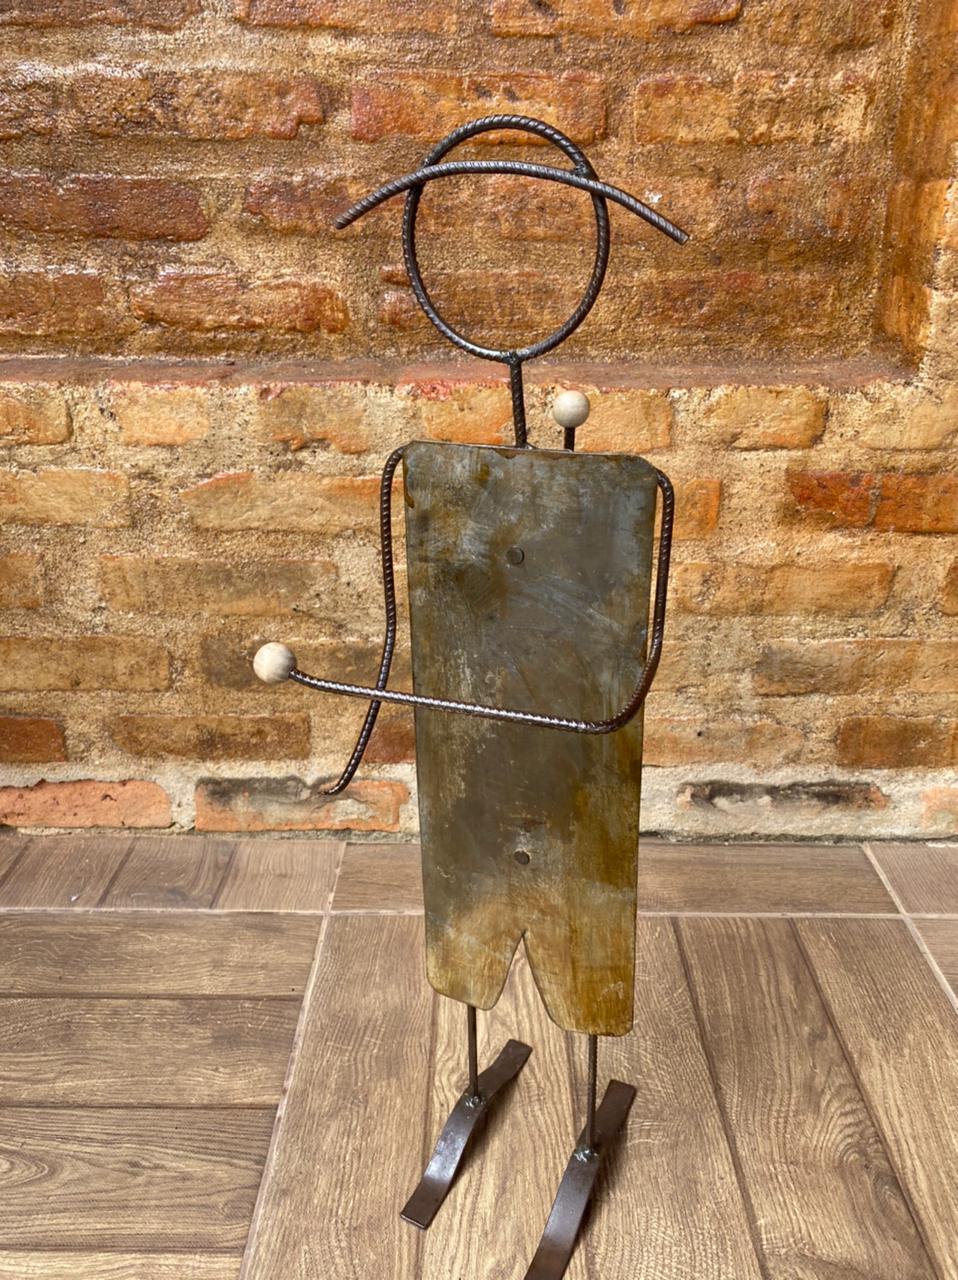 Porta Papel Higiênico em Ferro e Lata - Masculino